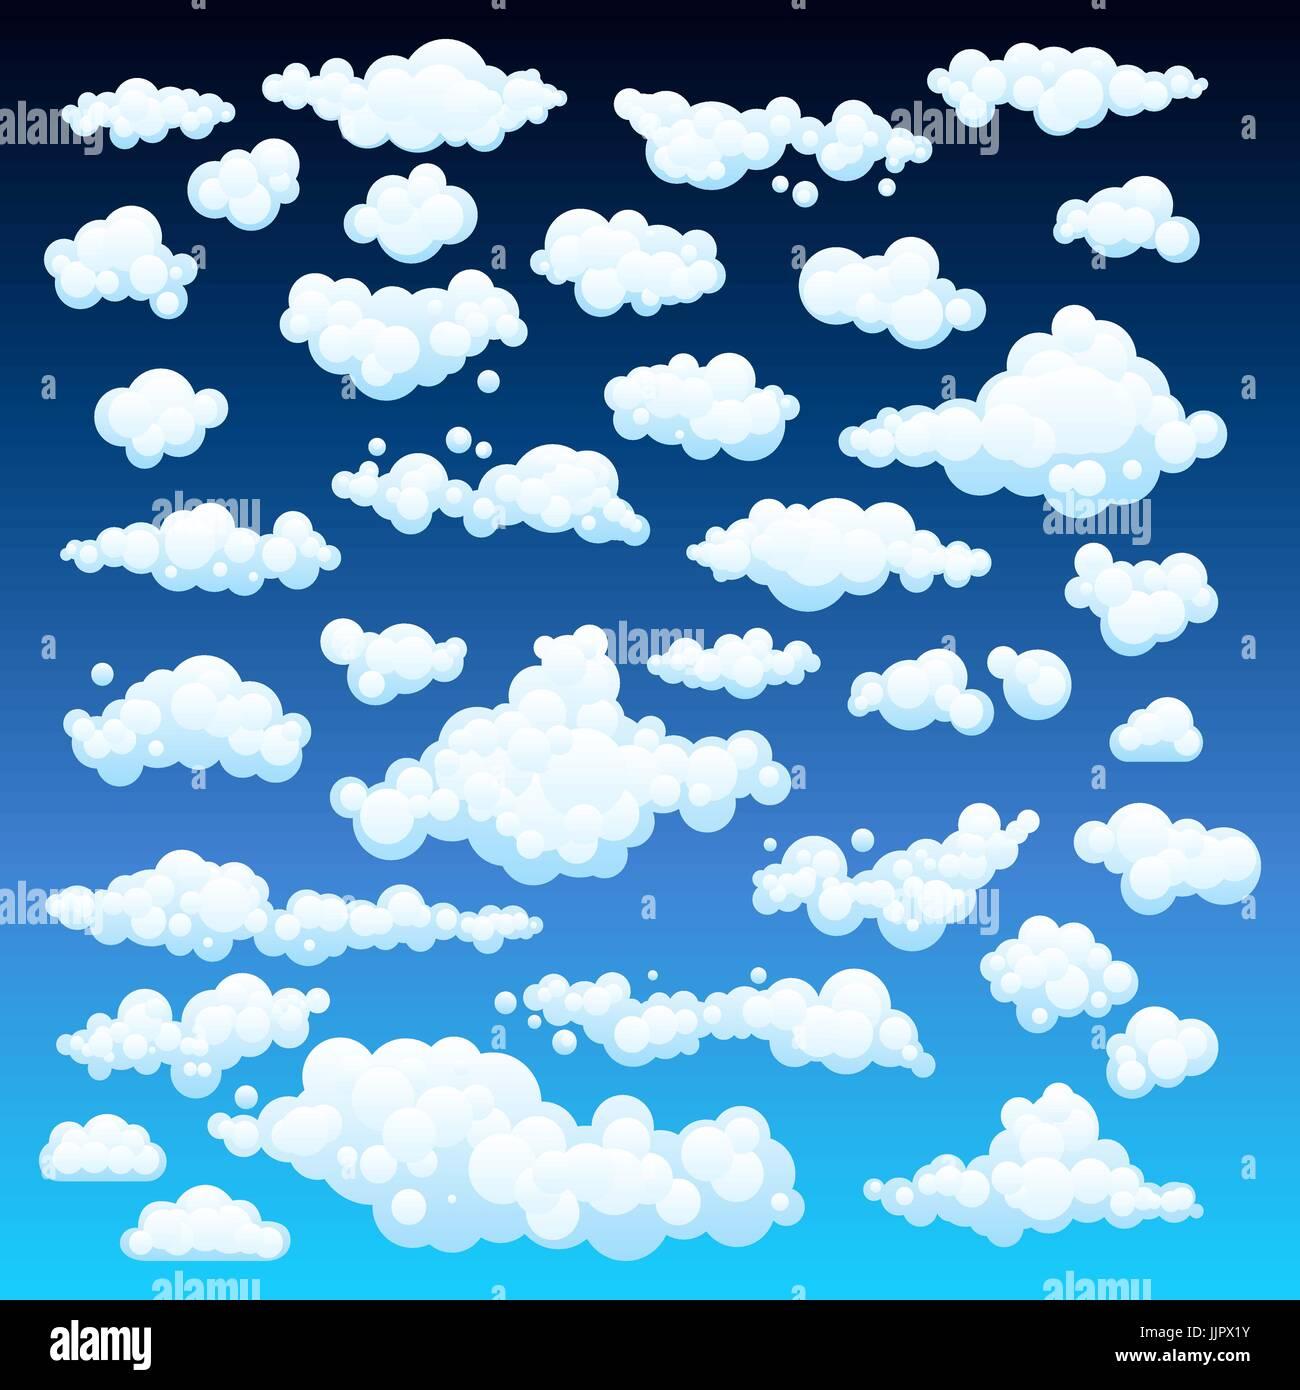 Cartoon Clouds Set On Blue Sky Background Set Of Funny Cartoon